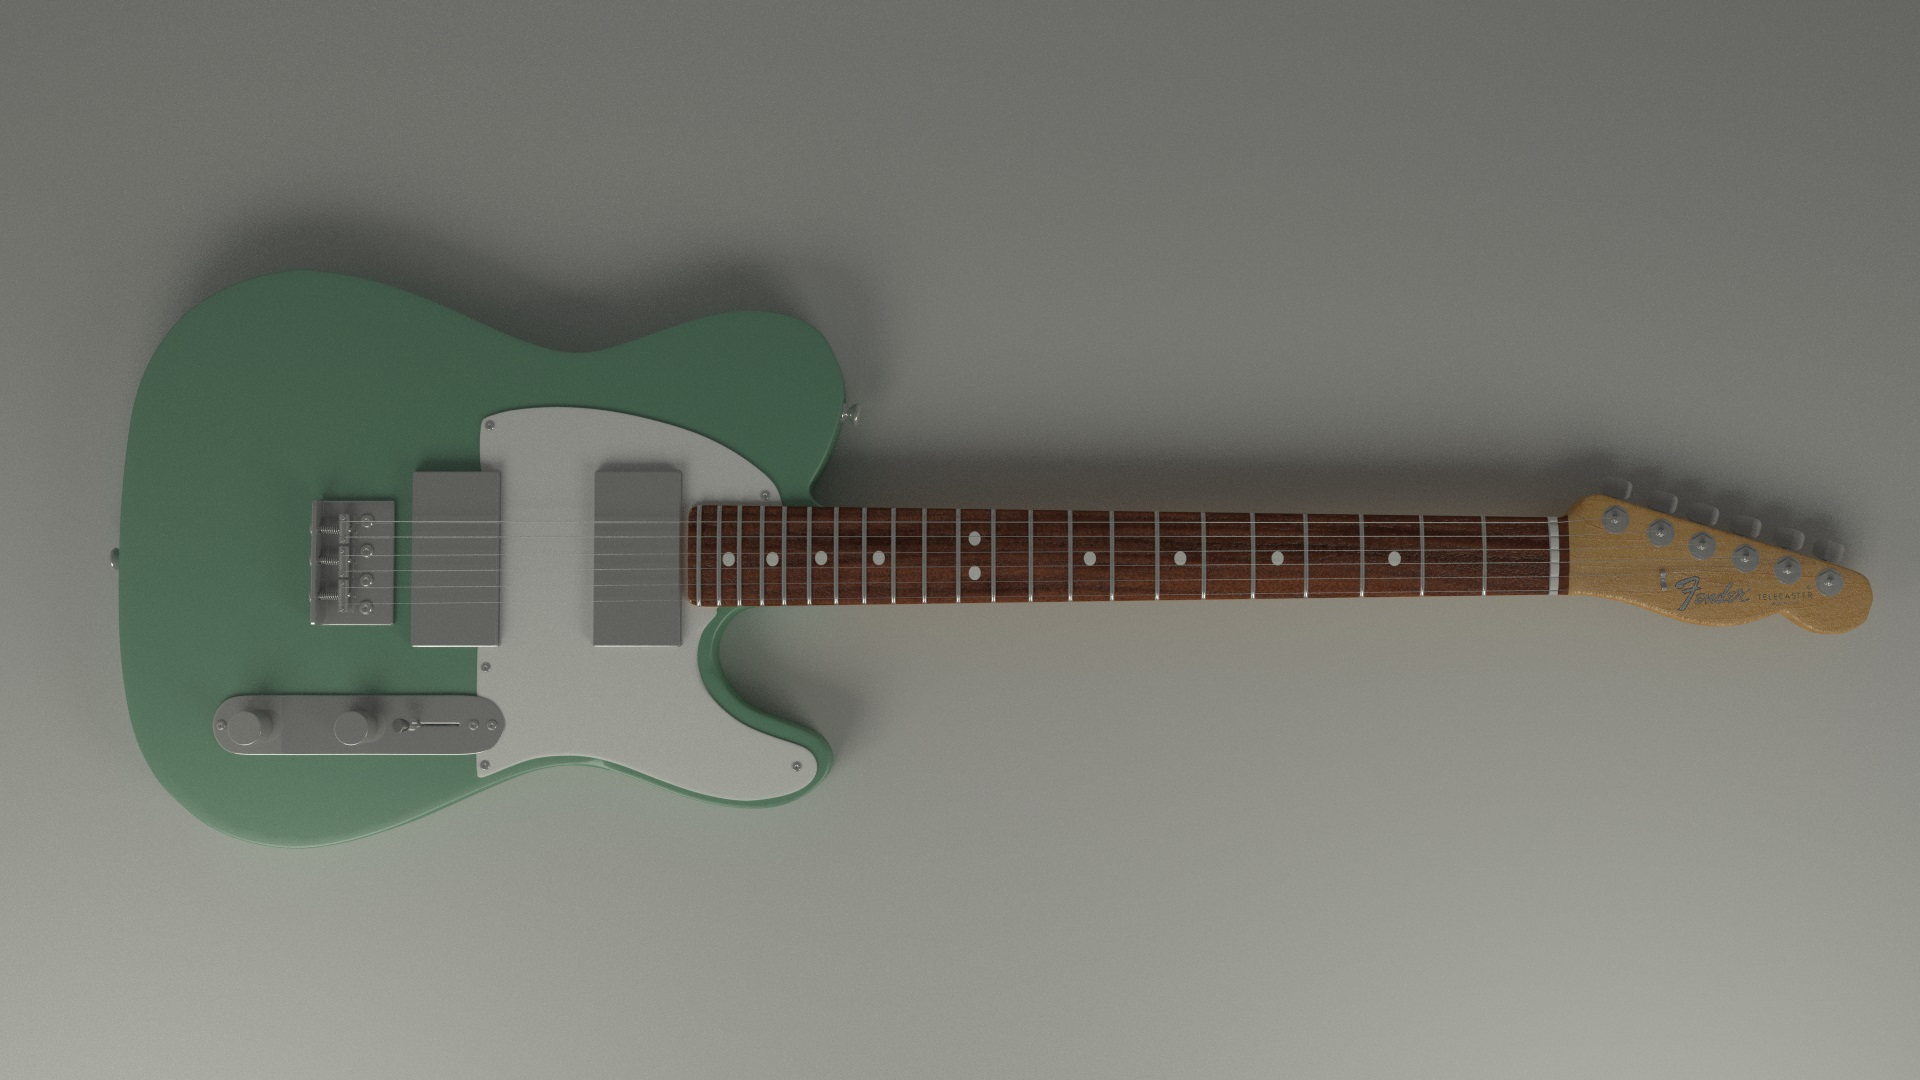 Fullsize Of Seafoam Green Color